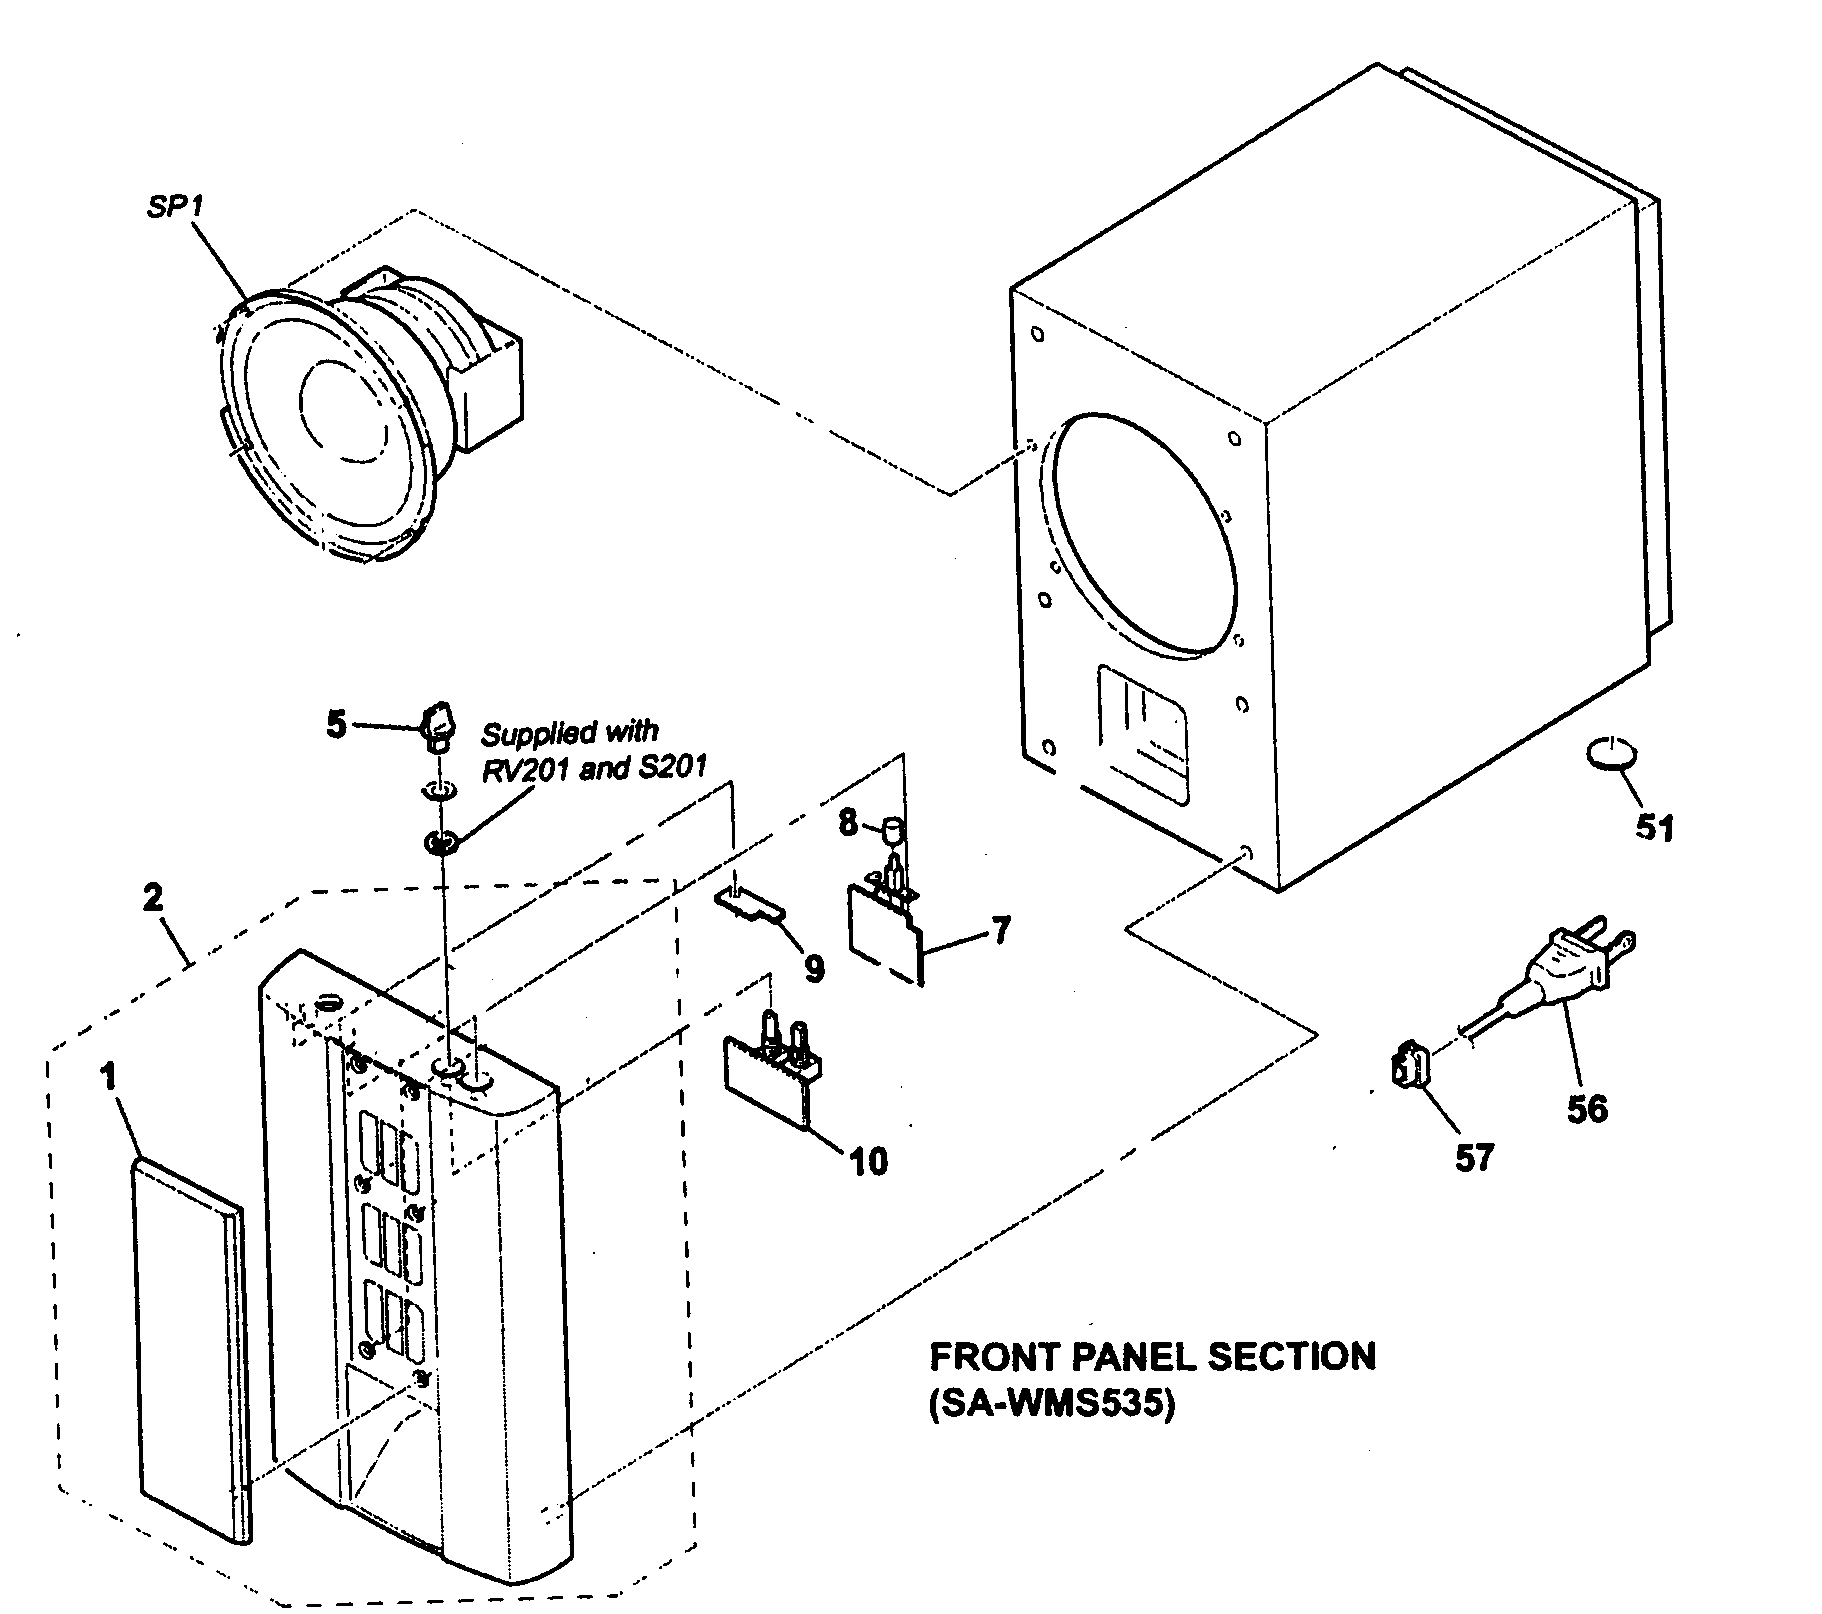 Remarkable Sony Model Sa Ve535H Speakers Genuine Parts Wiring Cloud Itislusmarecoveryedborg